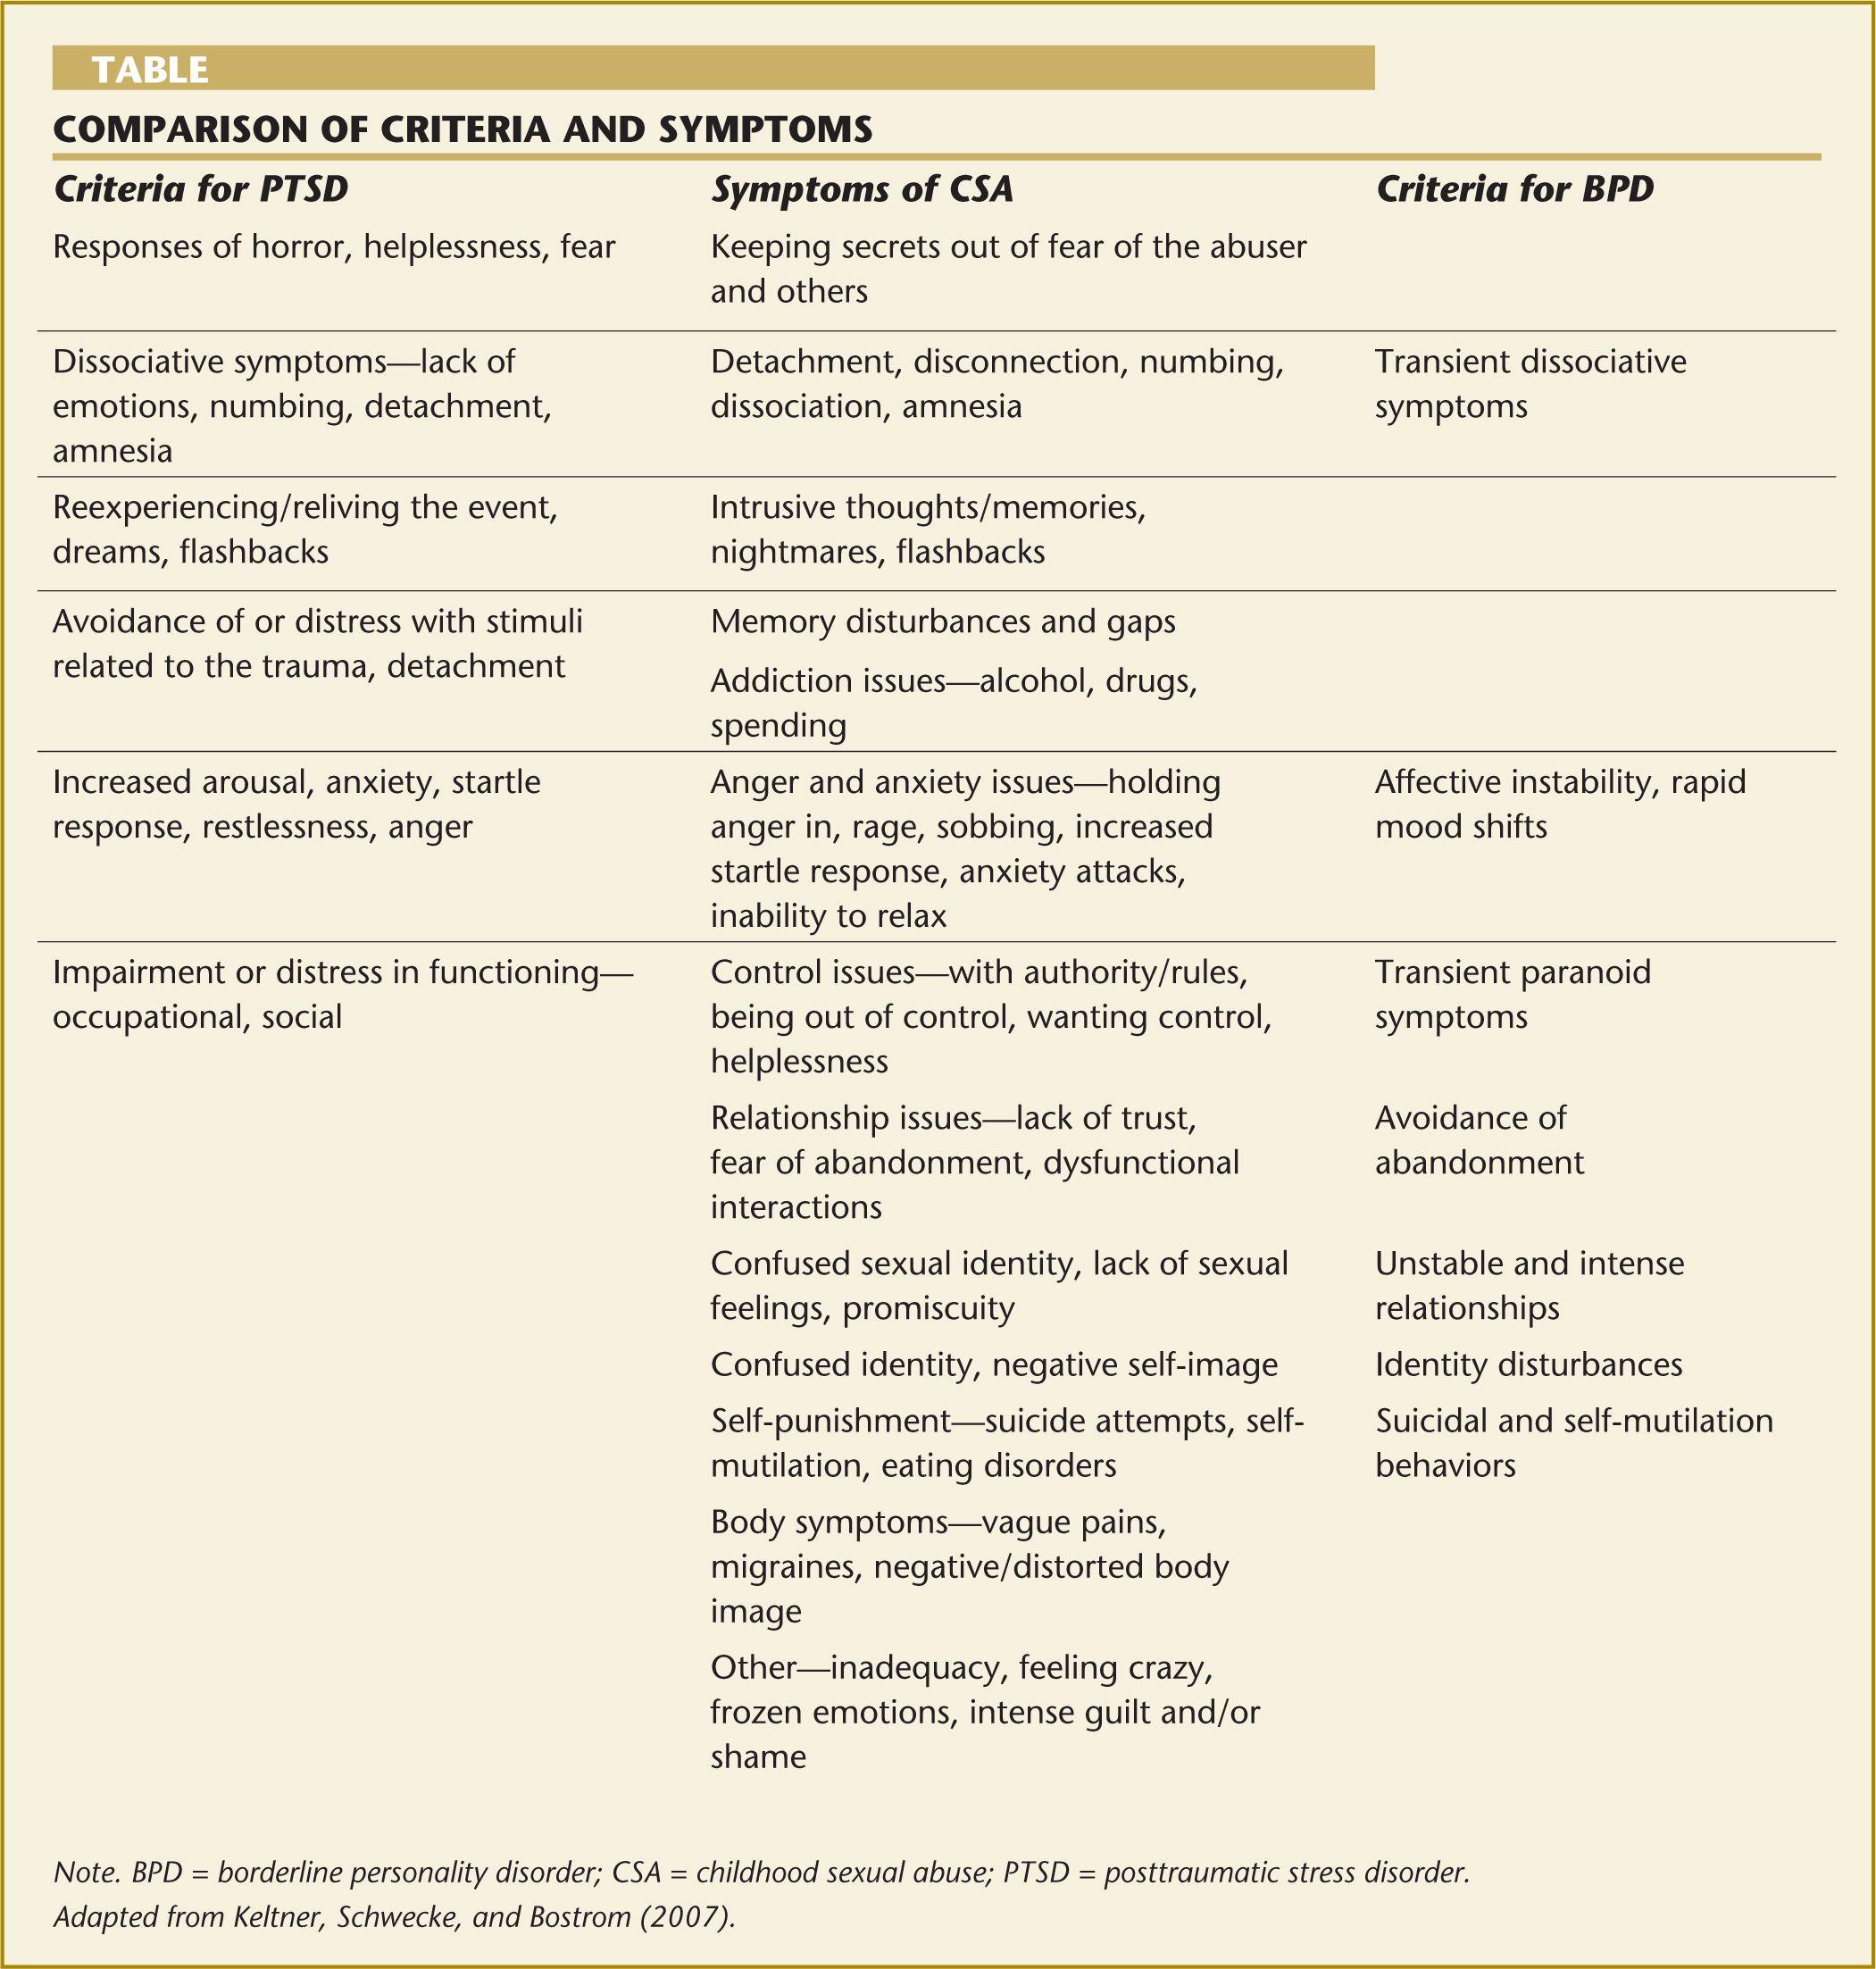 Comparison Of Criteria And Symptoms Of Post Traumatic